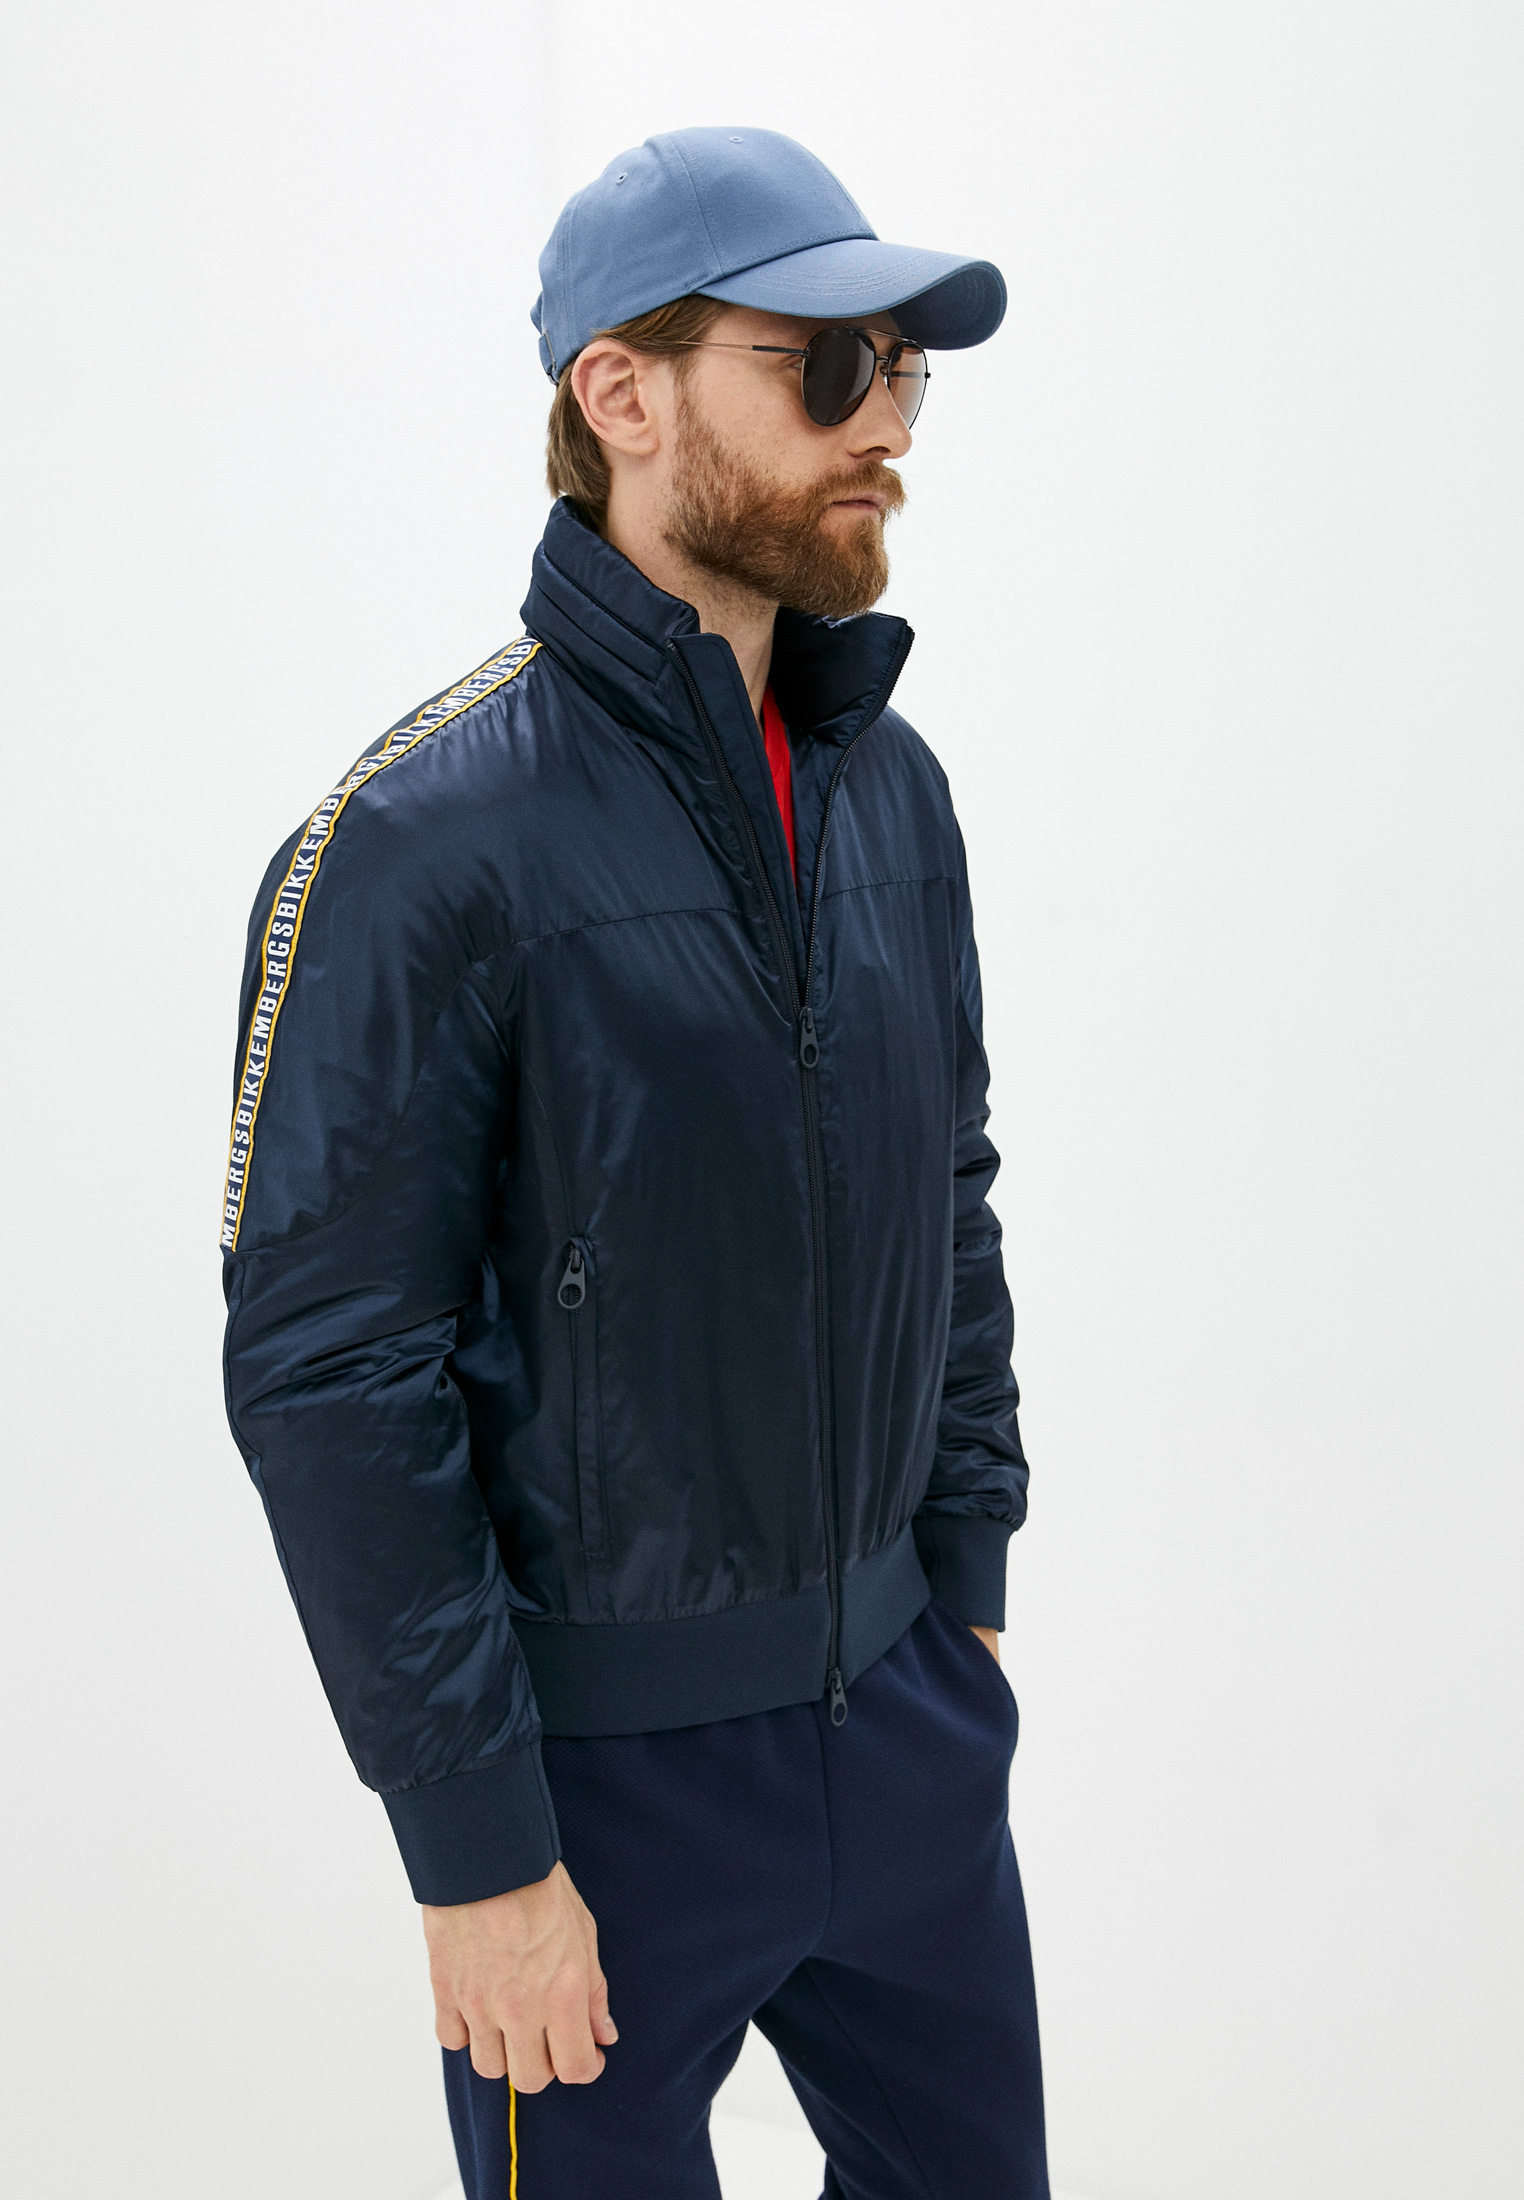 Мужская куртка Bikkembergs (Биккембергс) C H 158 80 T 146A